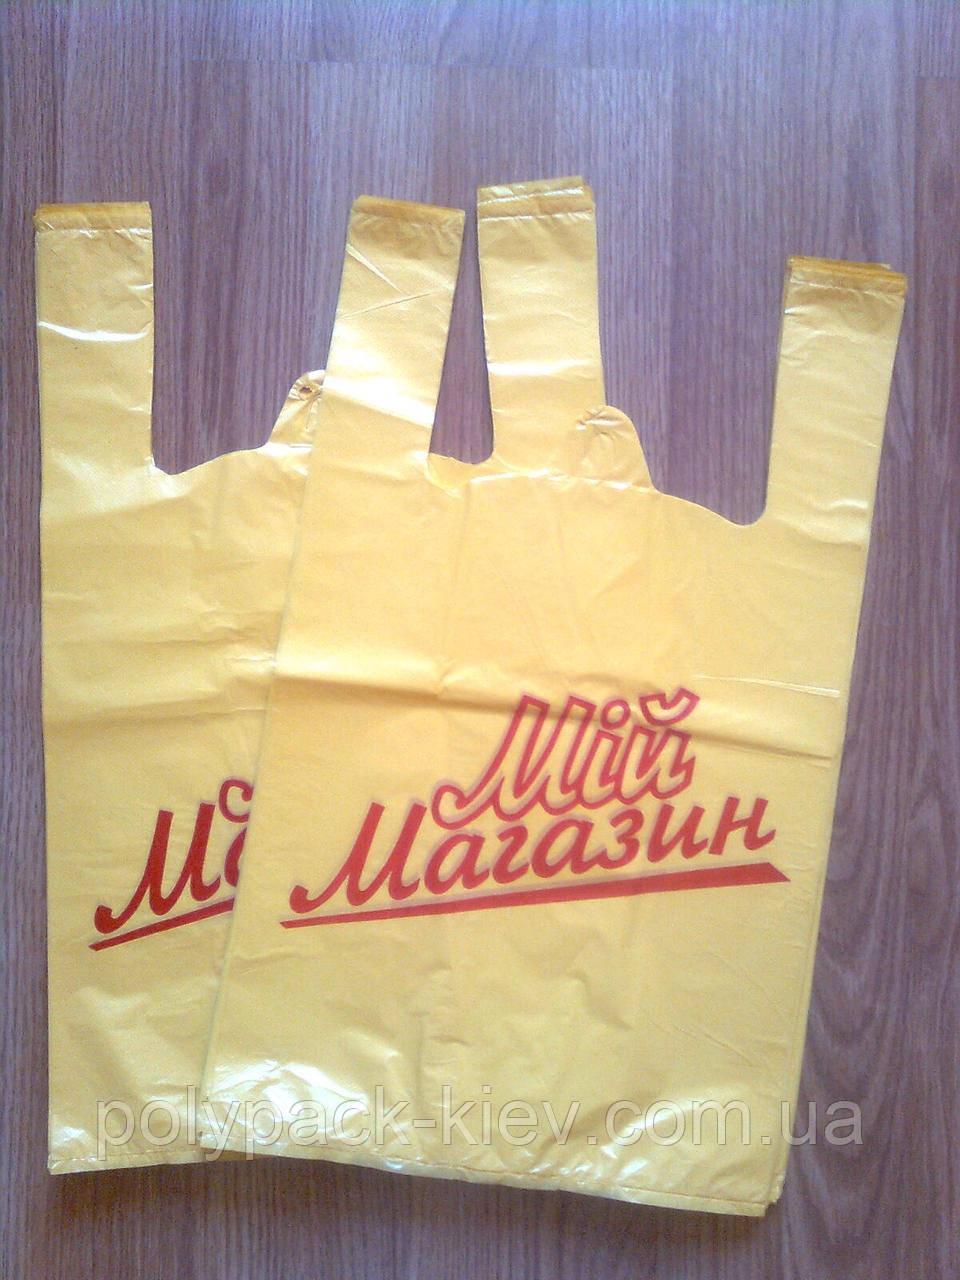 "Пакеты-майка ""Мій магазин"" 31х50 см/30 мкм, пакет ""Мой магазин"" с логотипом"